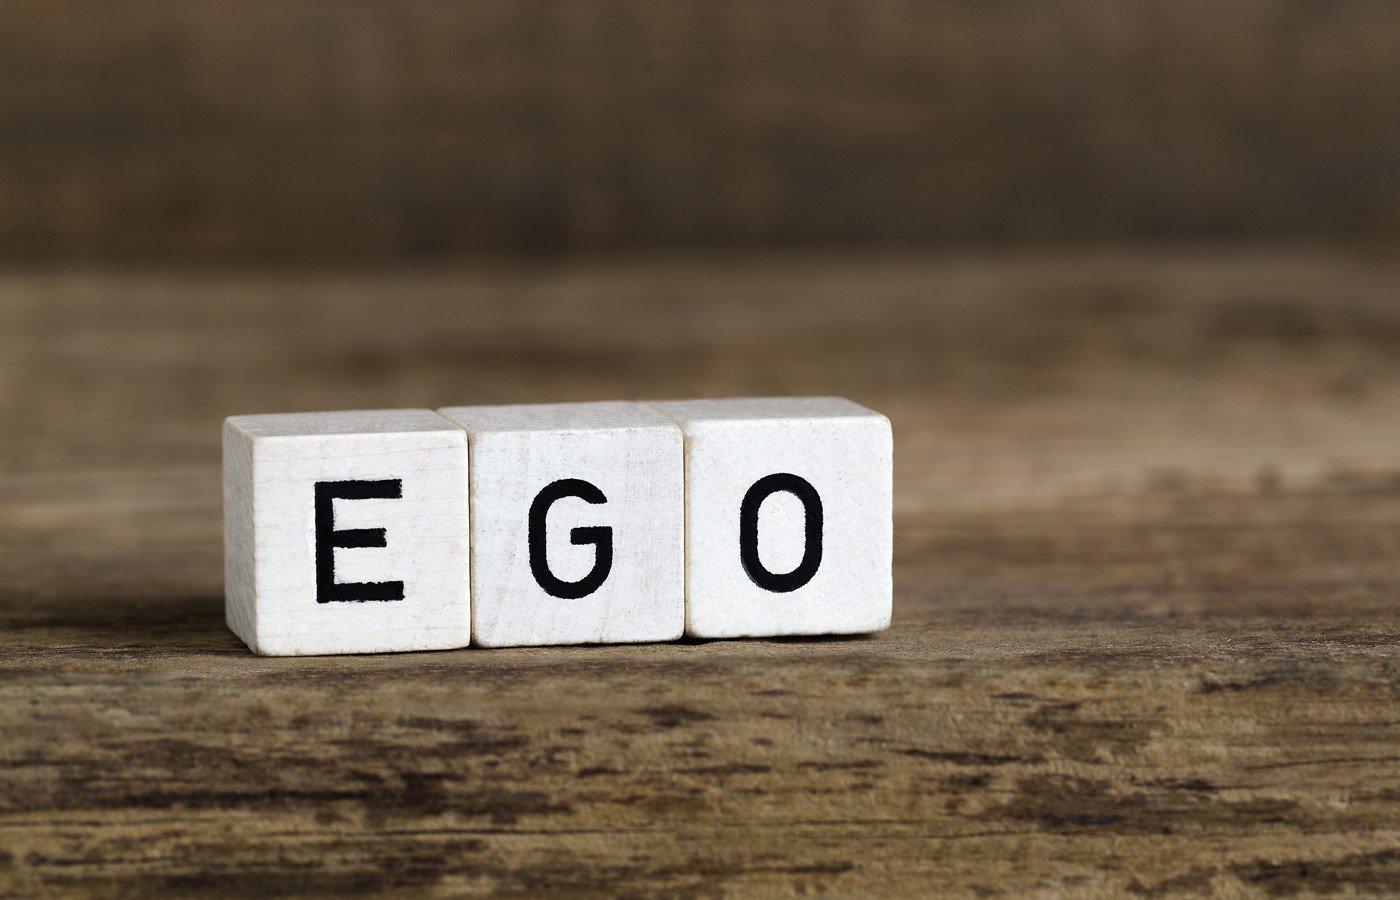 L'Ego ostacola le relazioni